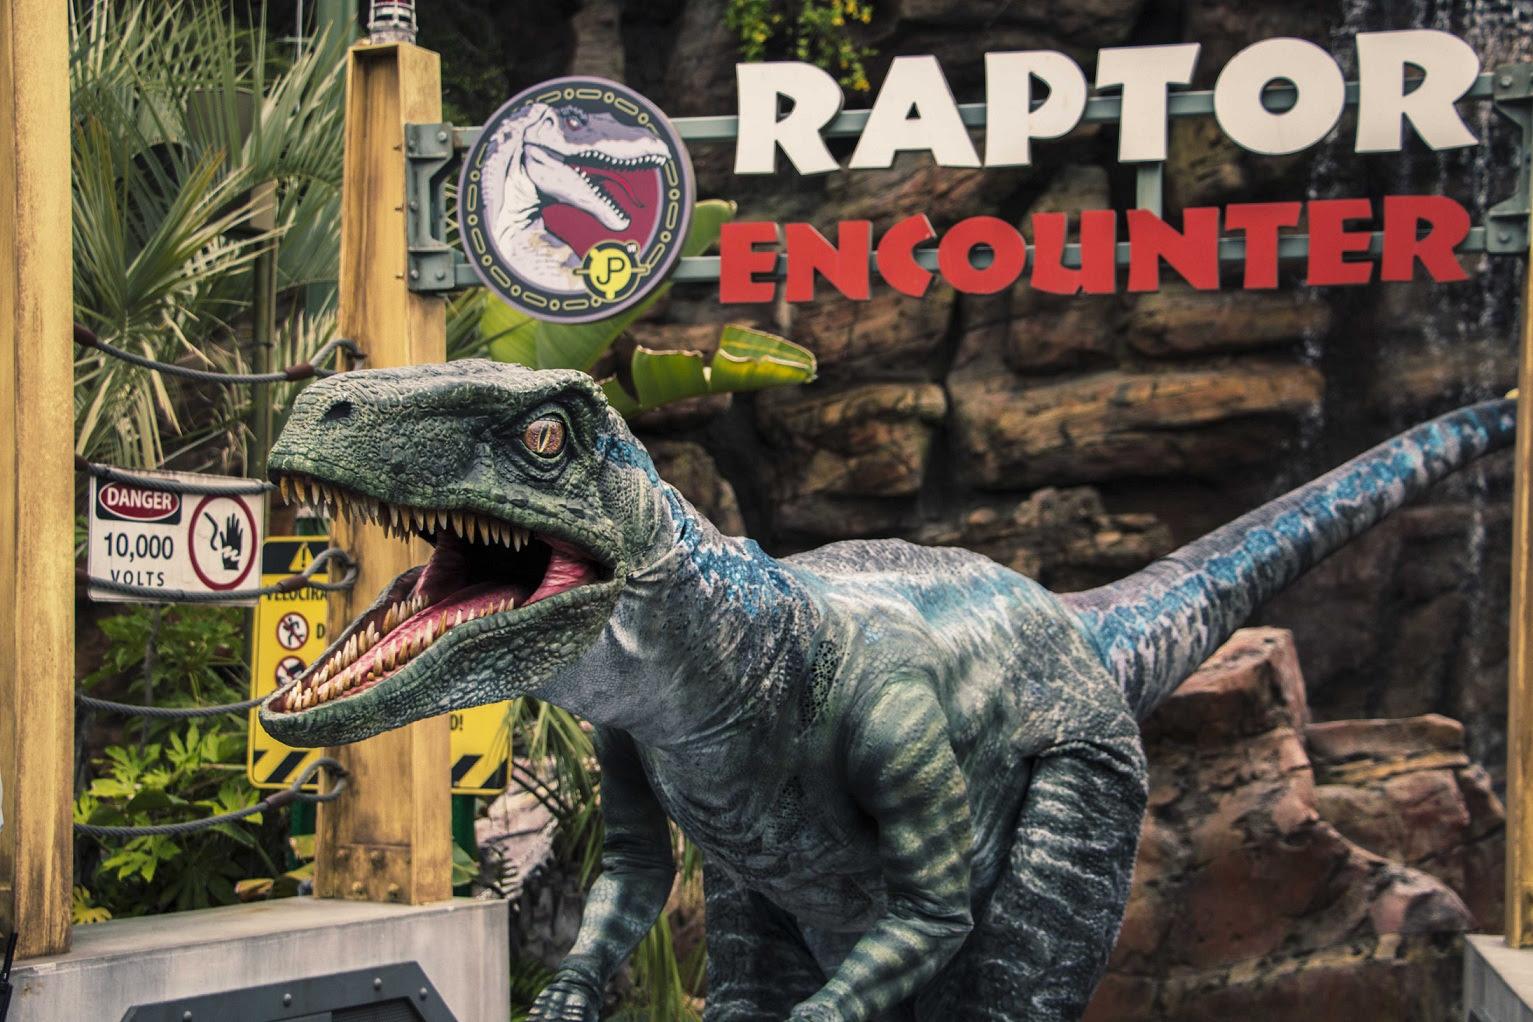 Blue, a Velociraptor da franquia Jurassic World da Universal Pictures